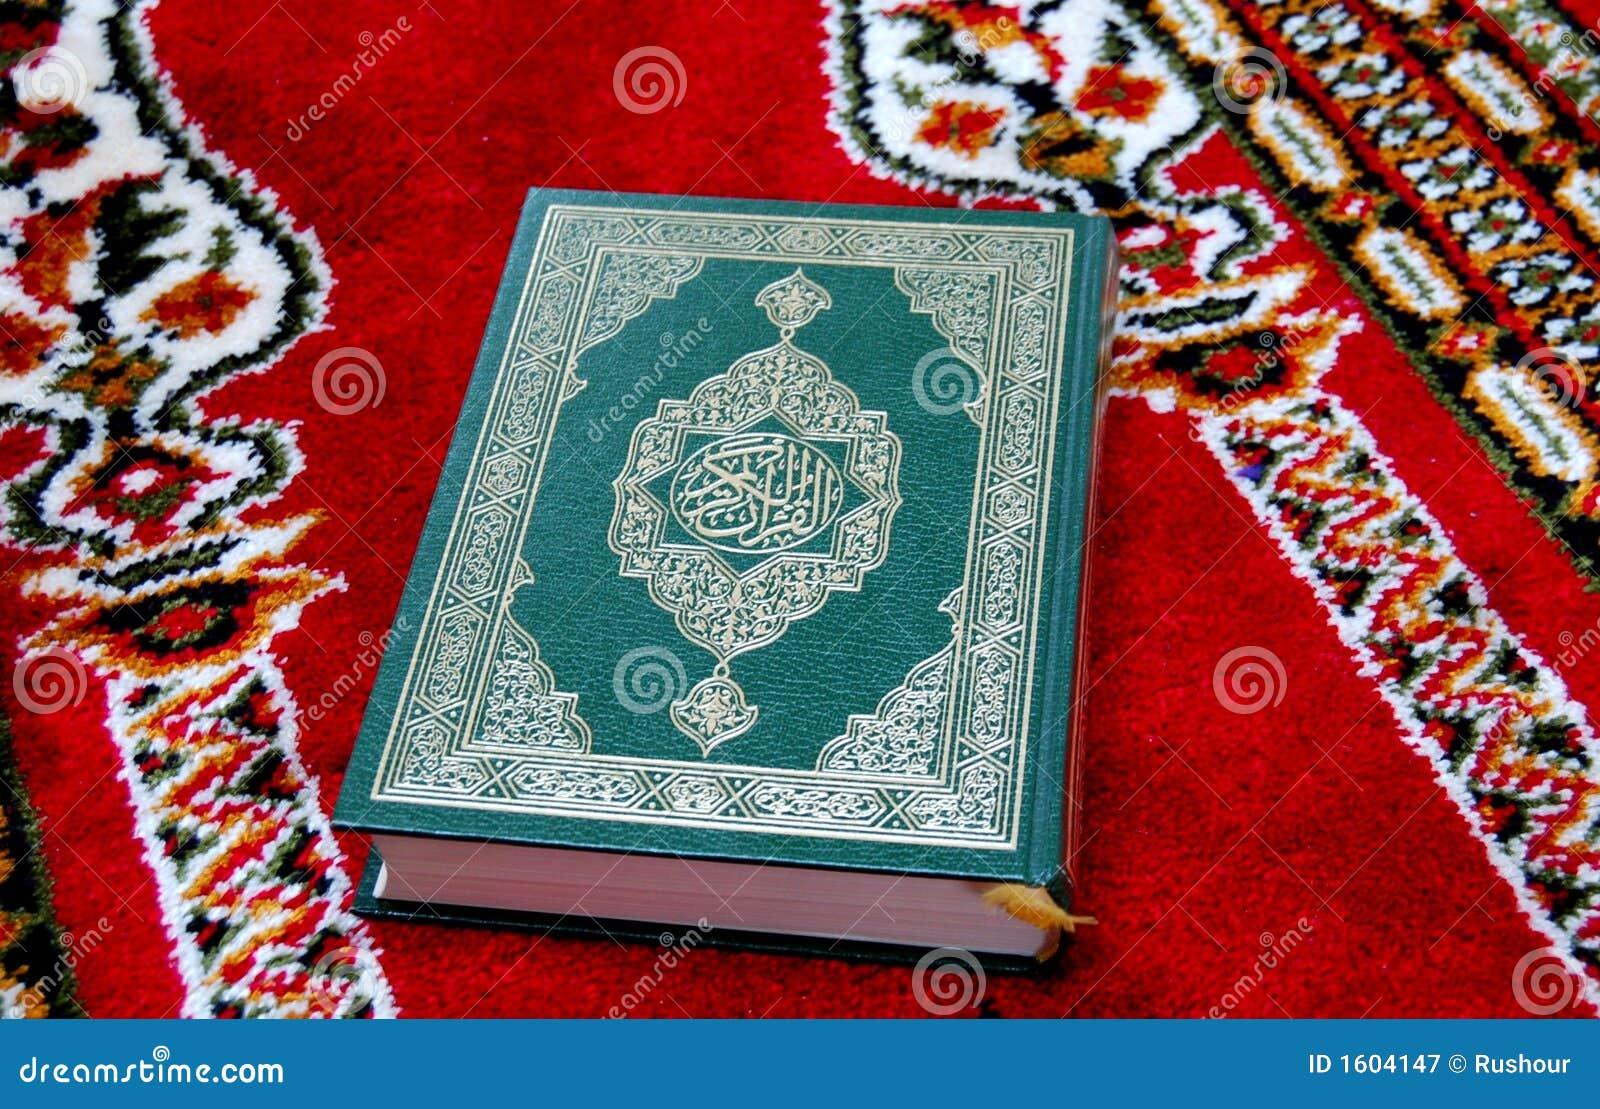 free holy quran